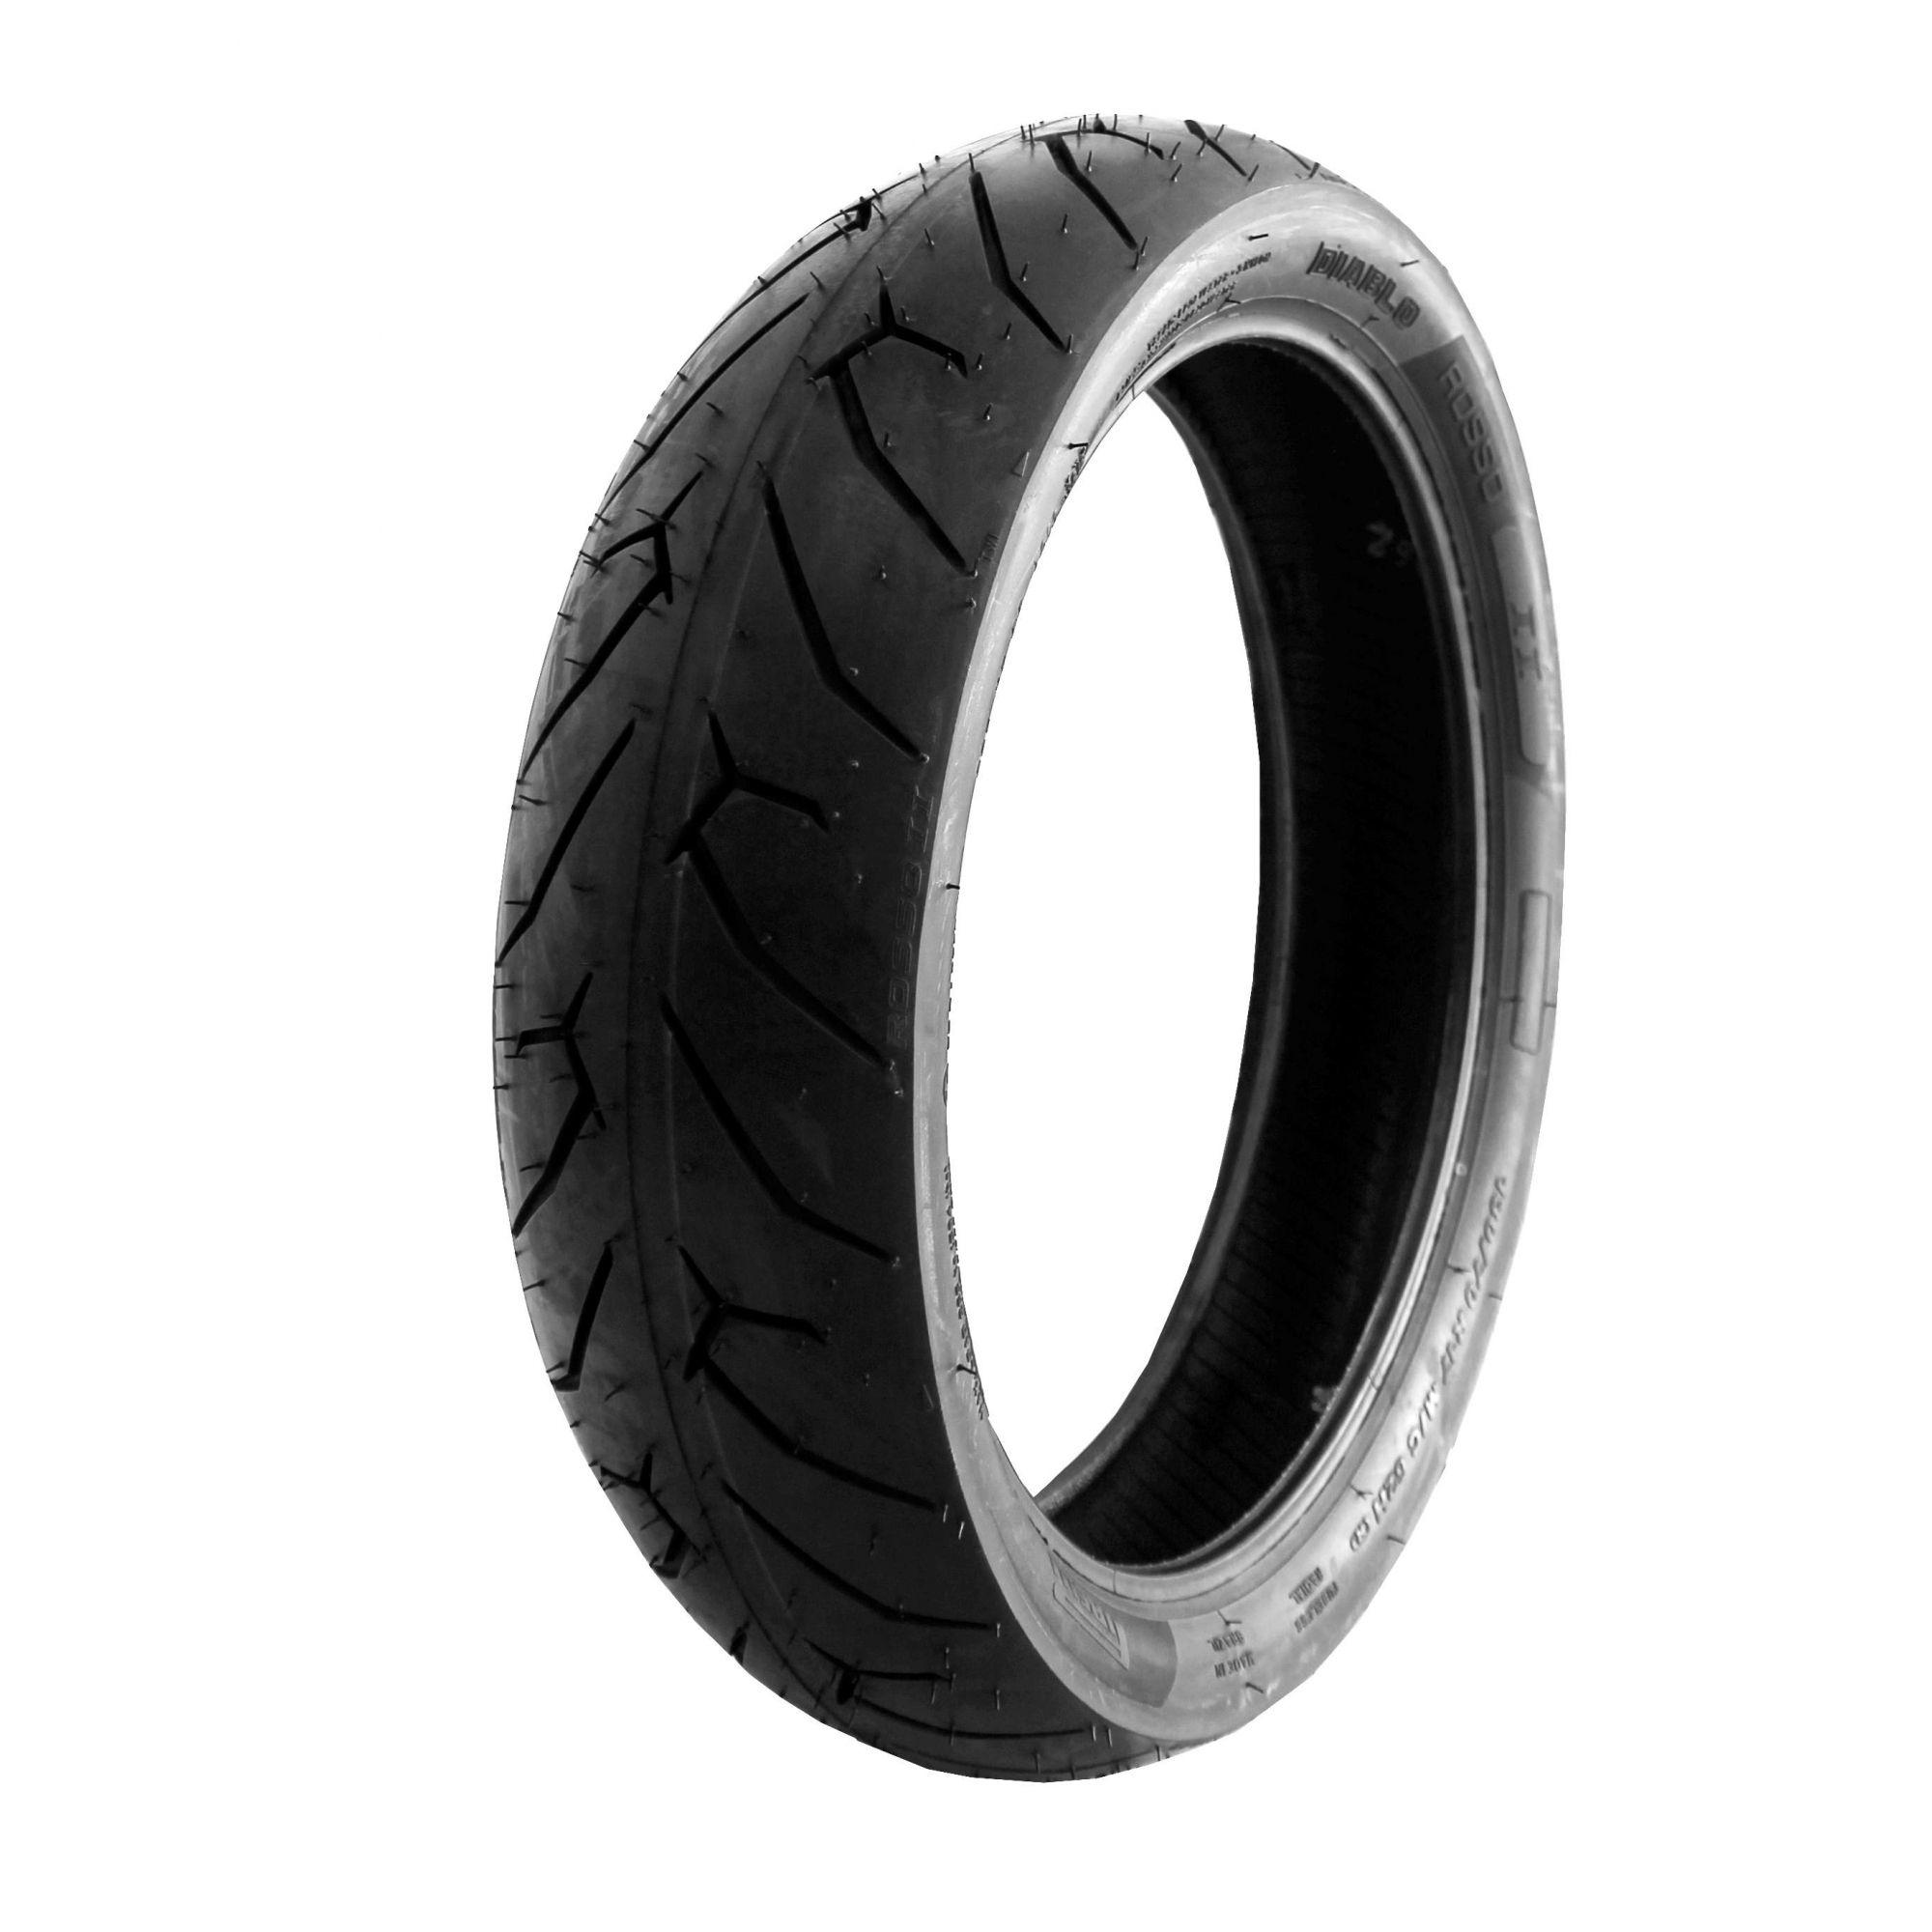 Pneu Cb 650 F 180/55r17 Zr 73w Tl Diablo Rosso II Pirelli